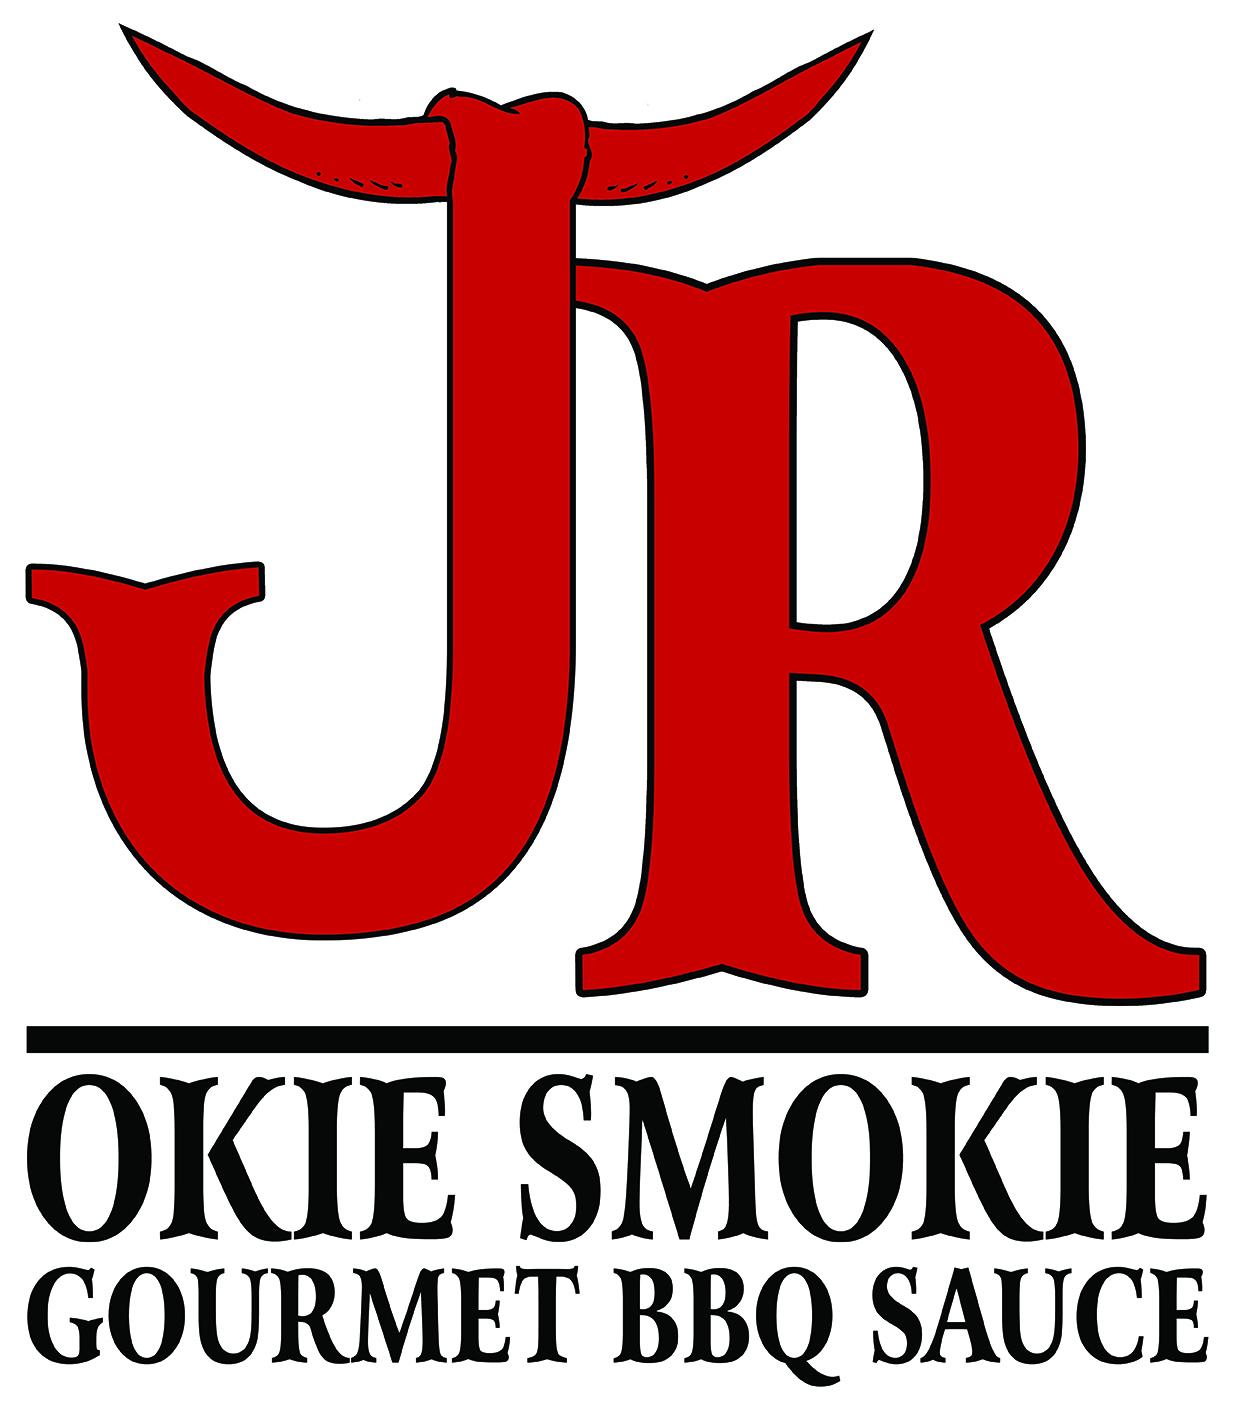 JR Okie Smokie LLC